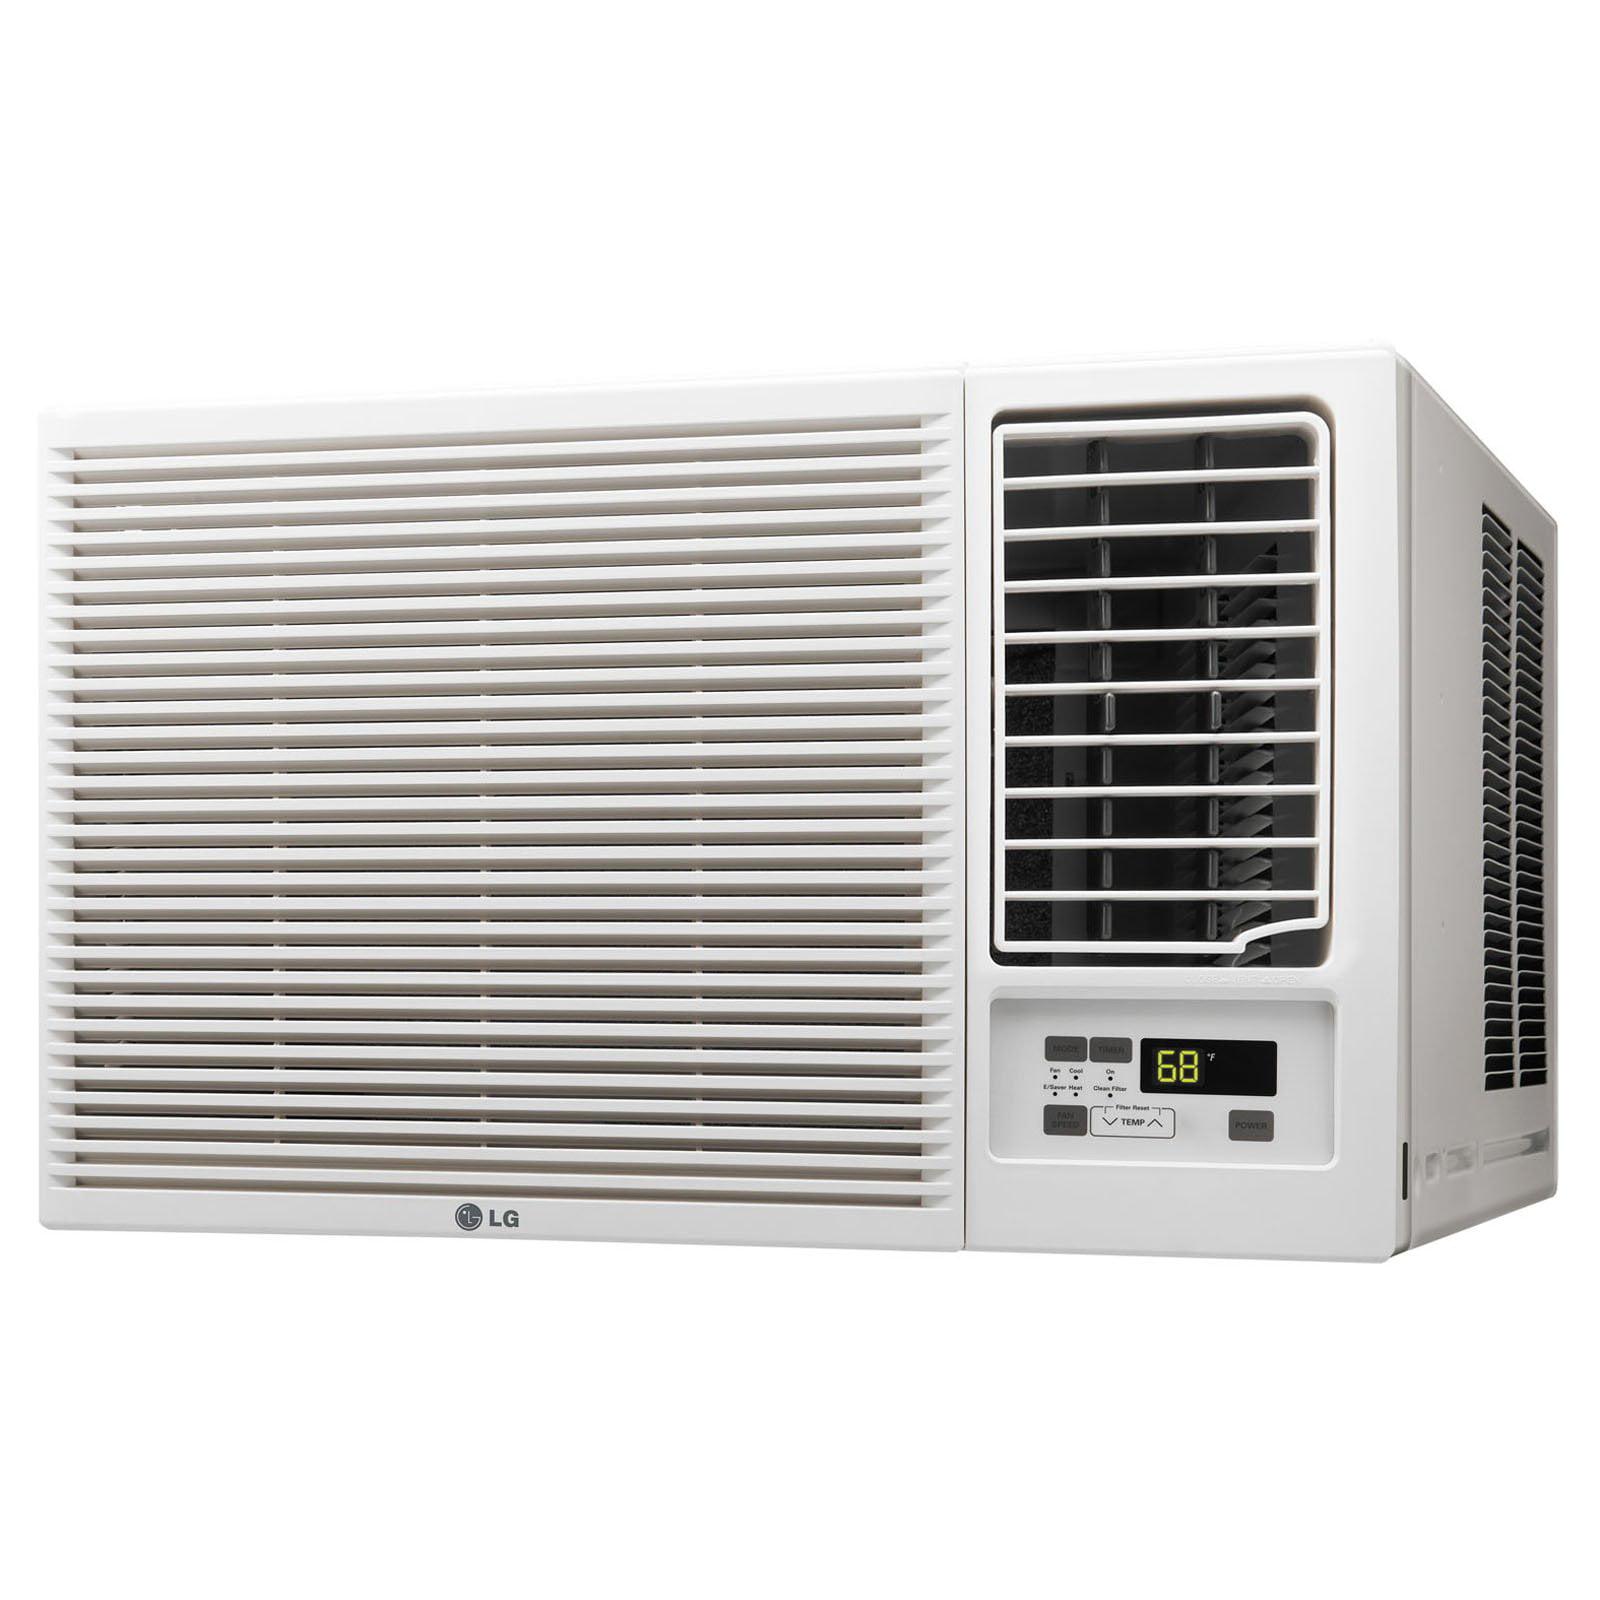 8000 BTU White GARRISON 2477811 R-410A Through-The-Wall Heat//Cool Air Conditioner with Remote Control